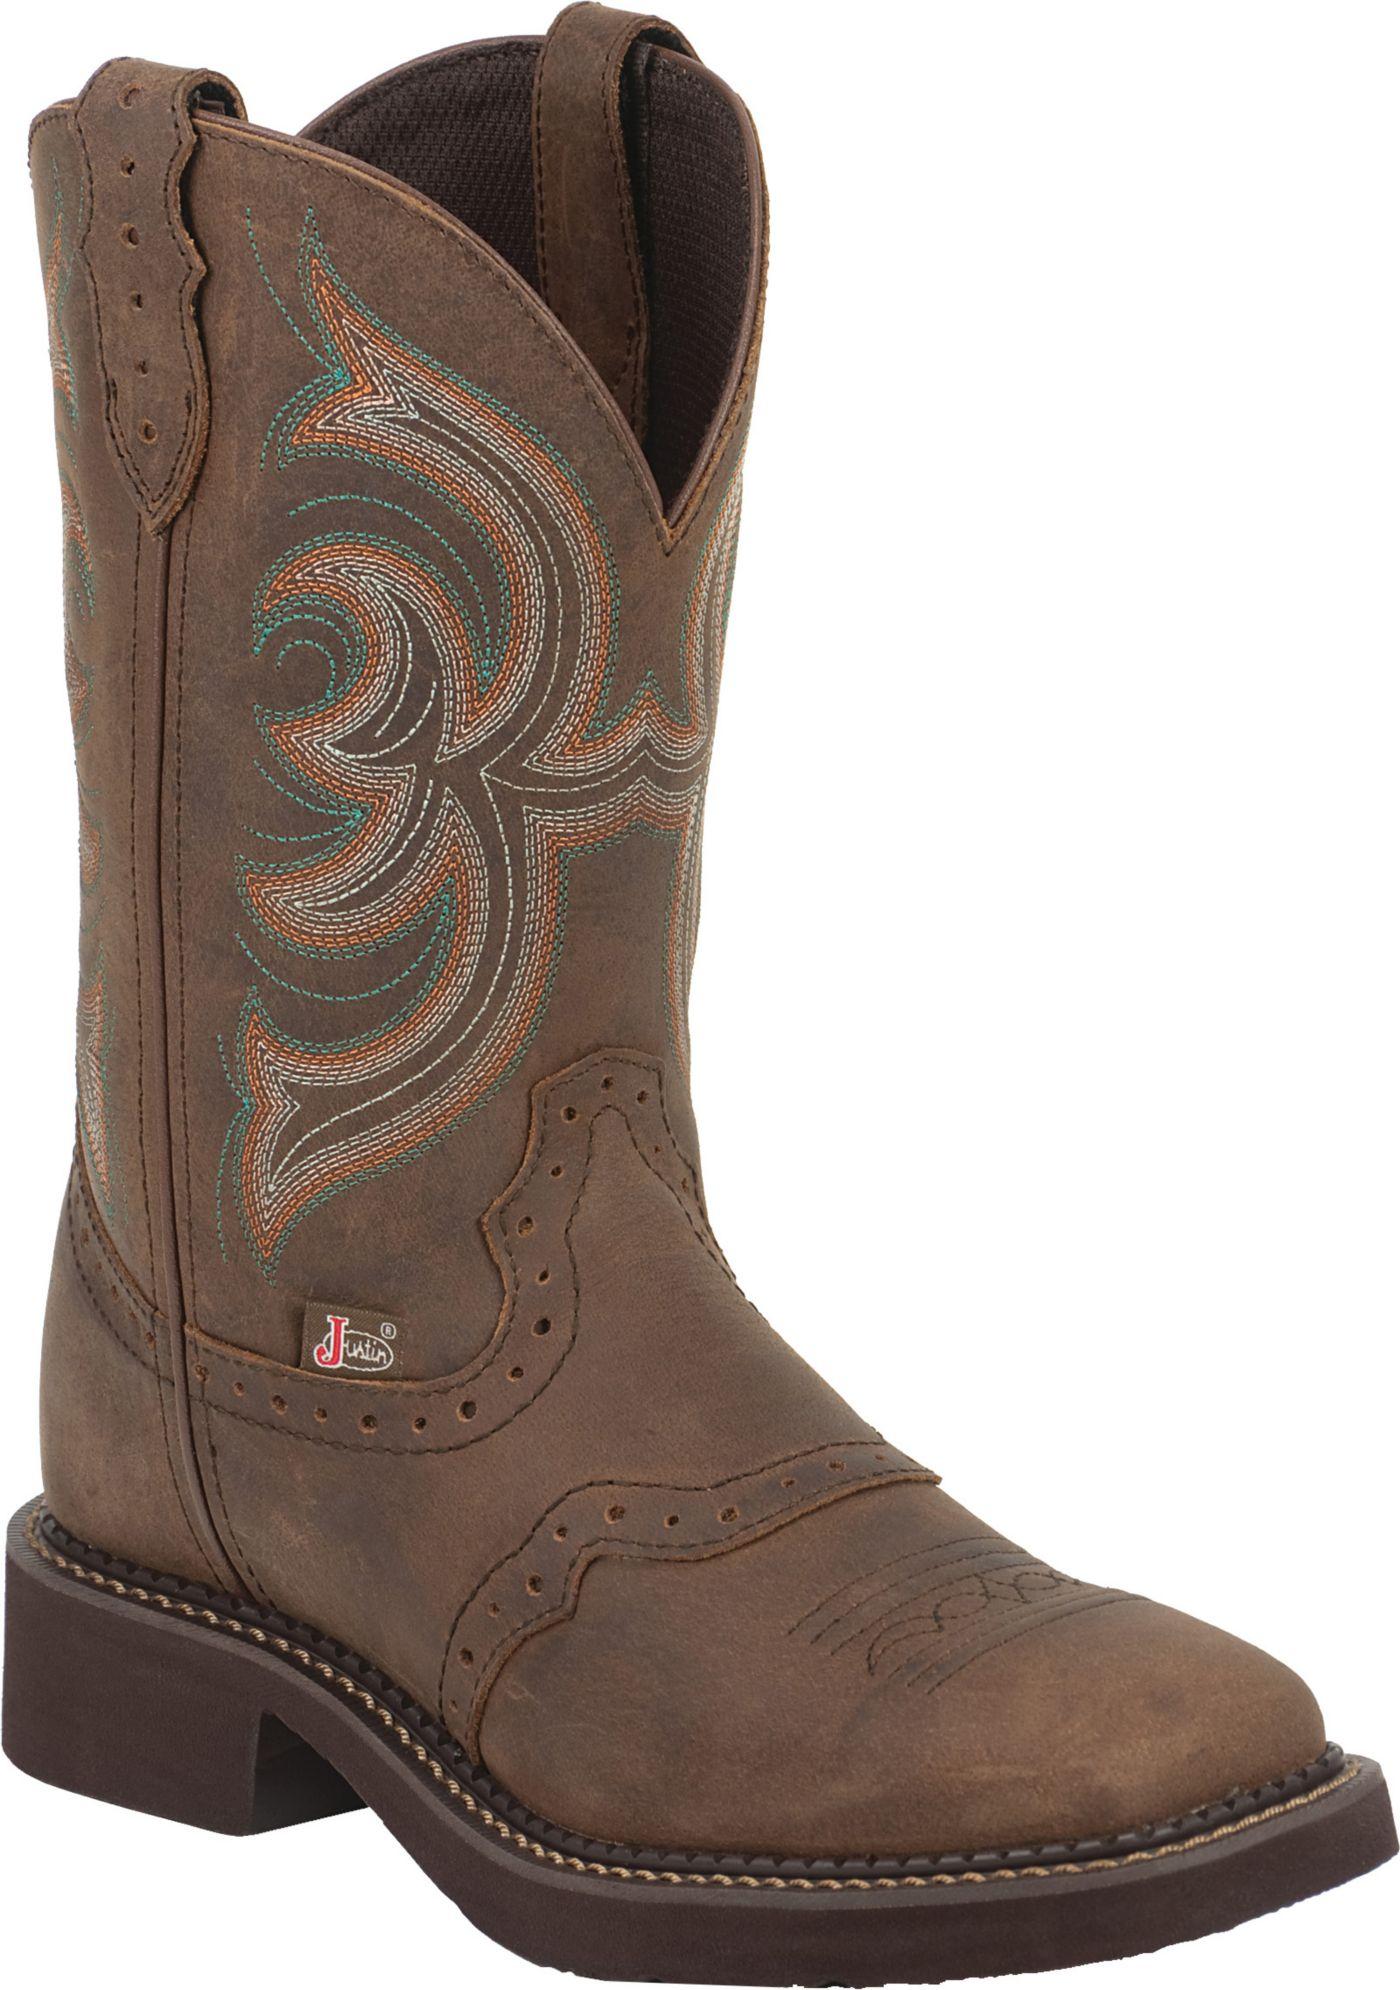 Justin Women's Gypsy Inji Western Boots